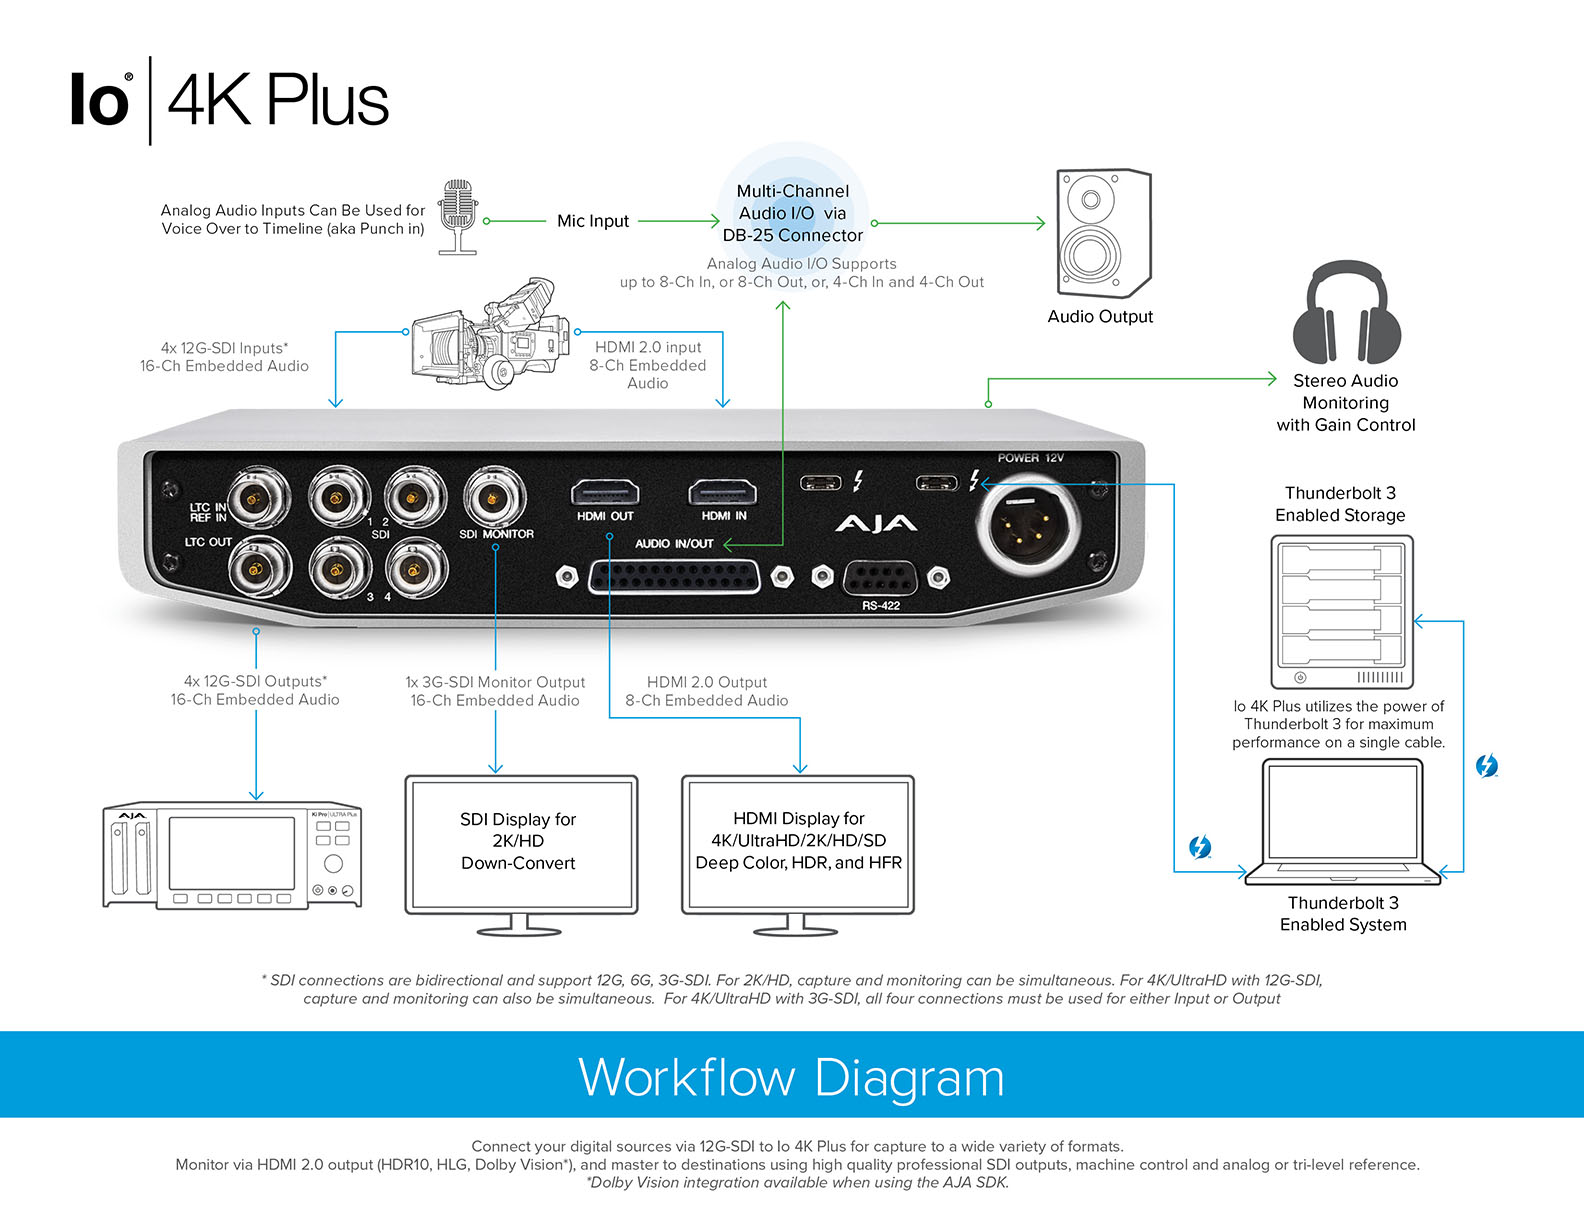 Io 4K Plus - Professional Video I/O with Thunderbolt™ 3 Performance